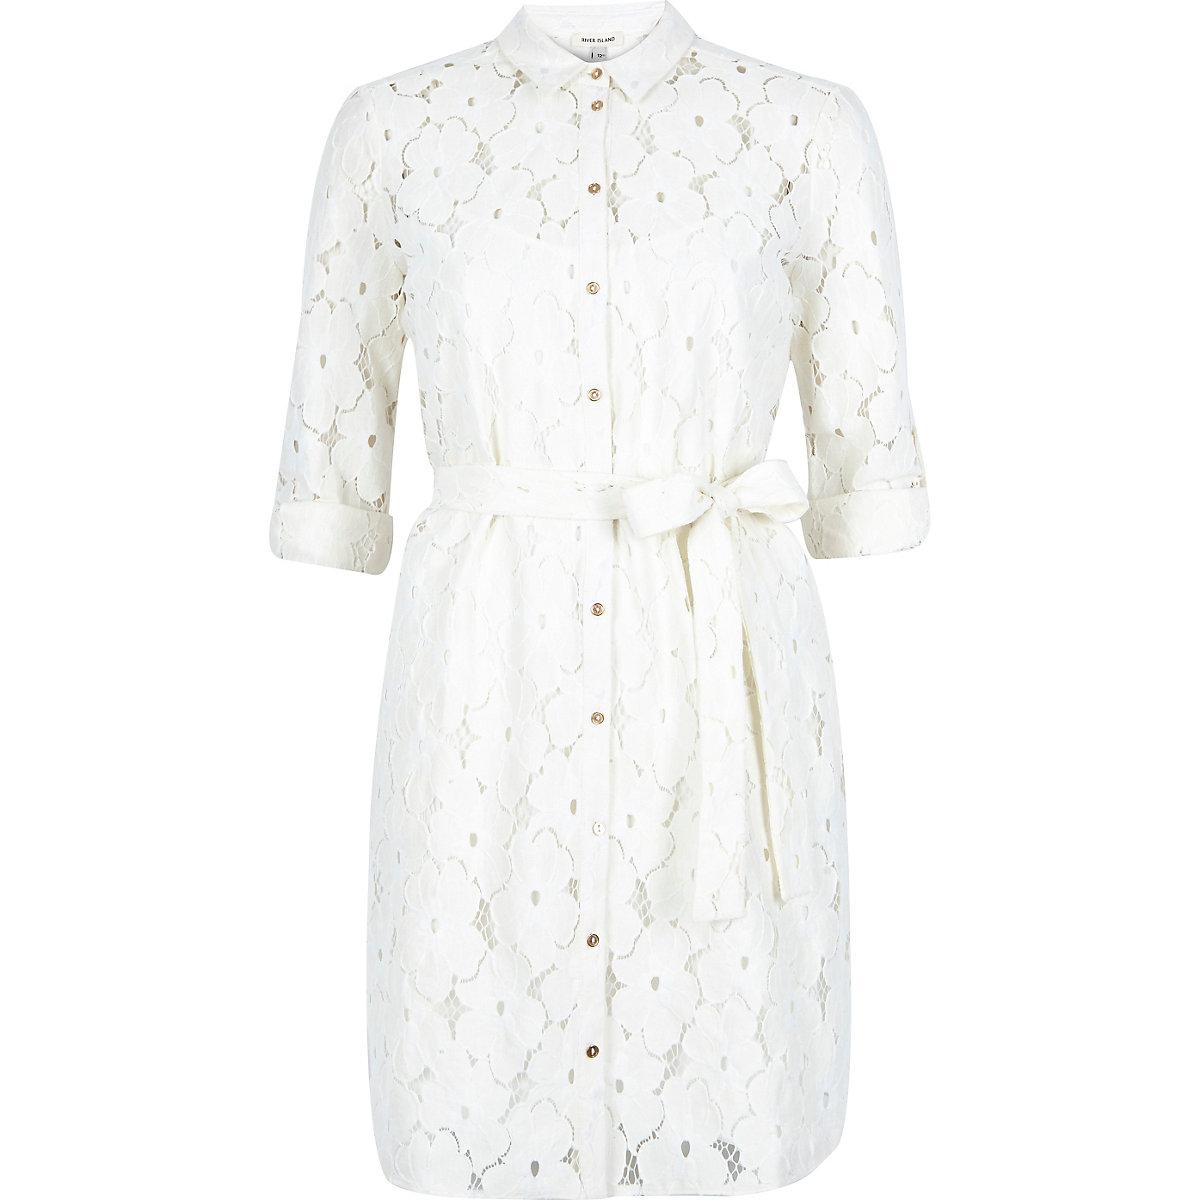 Cream lace shirt dress